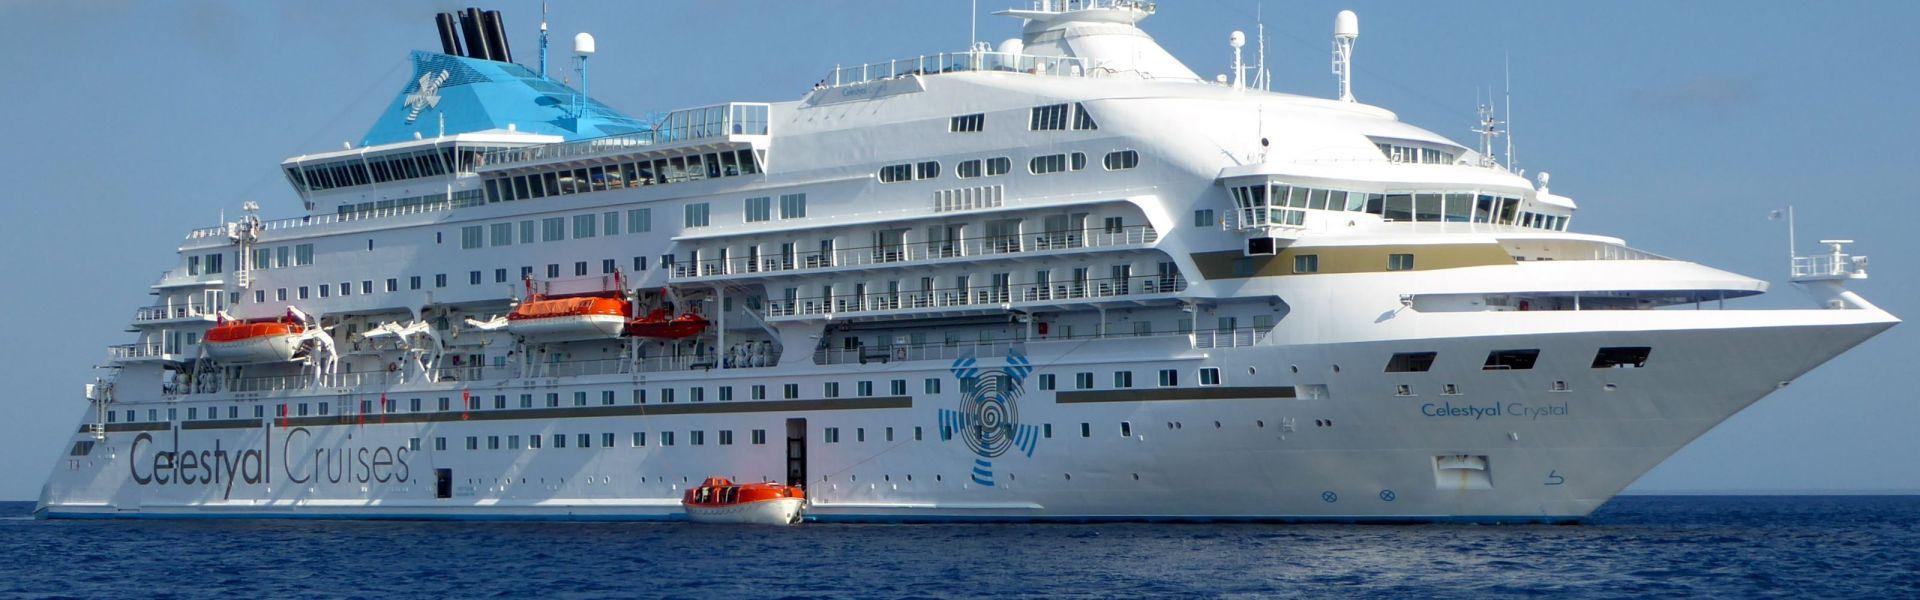 Croaziera 2018 - Mediterana de Est (Atena) - Celestyal Cruises - Celestyal Crystal - 3 nopti